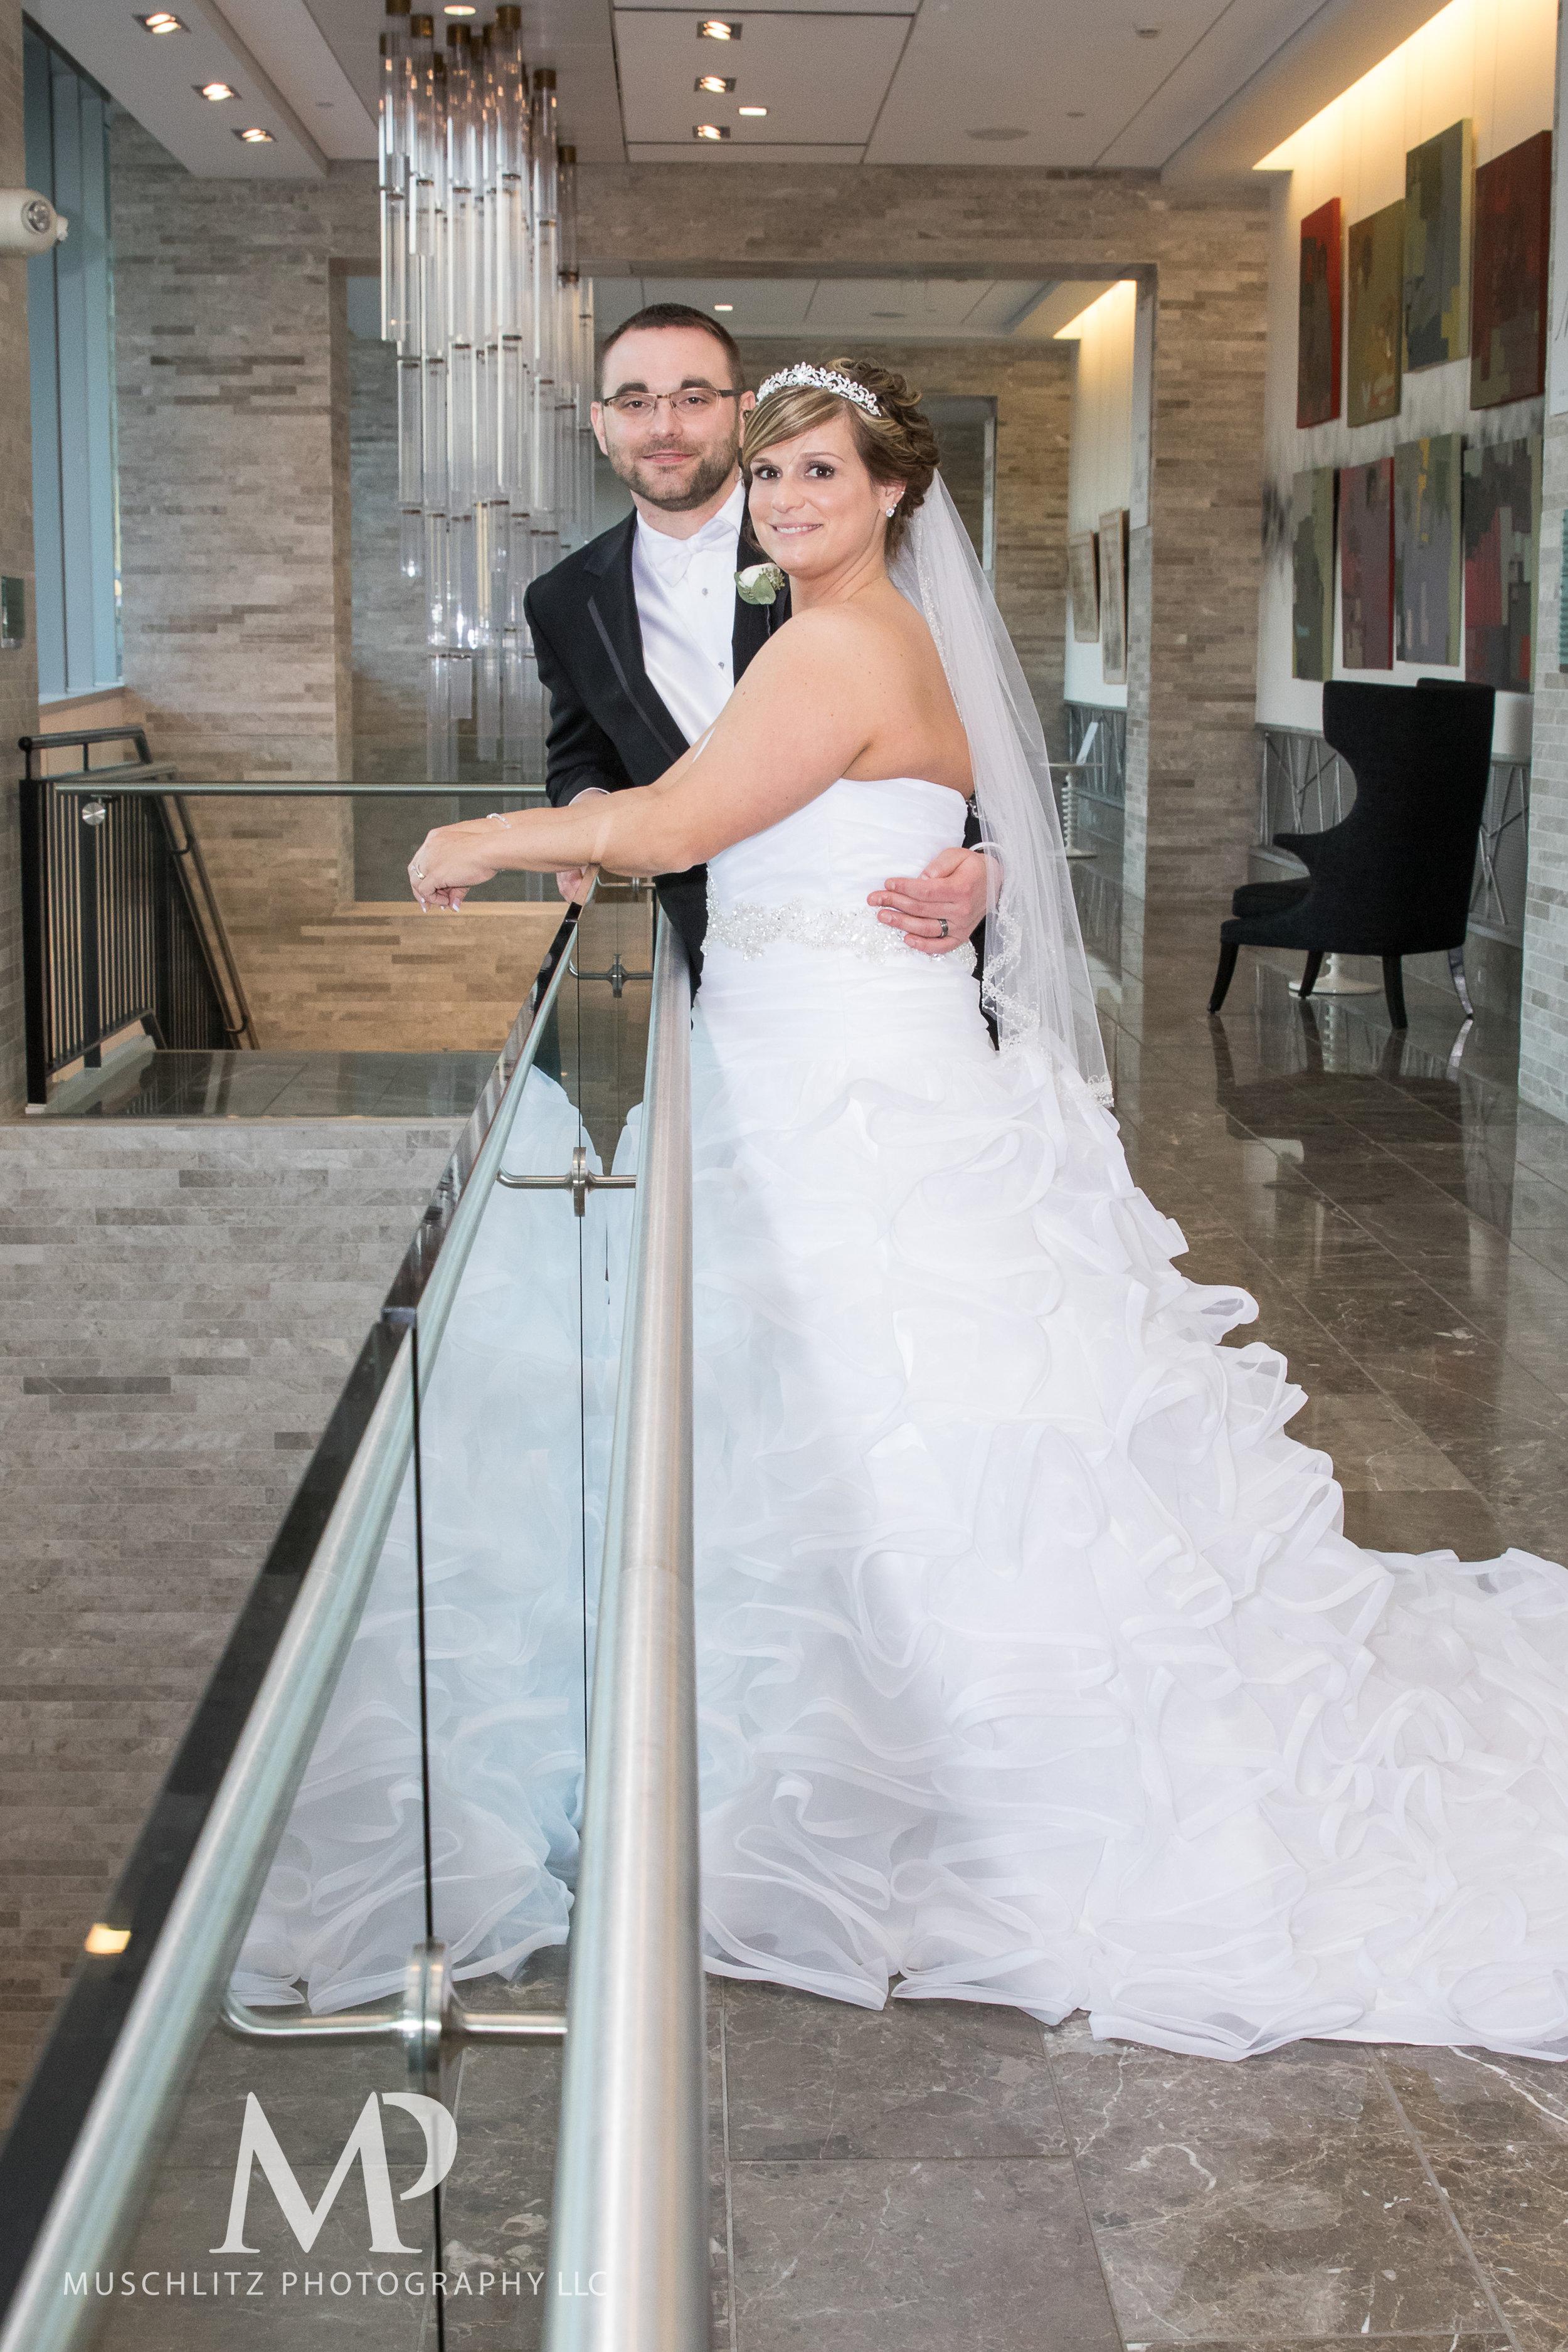 the hilton-columbus-wedding-portraits-downtown-columbus-ohio-muschlitz-photography-006.JPG